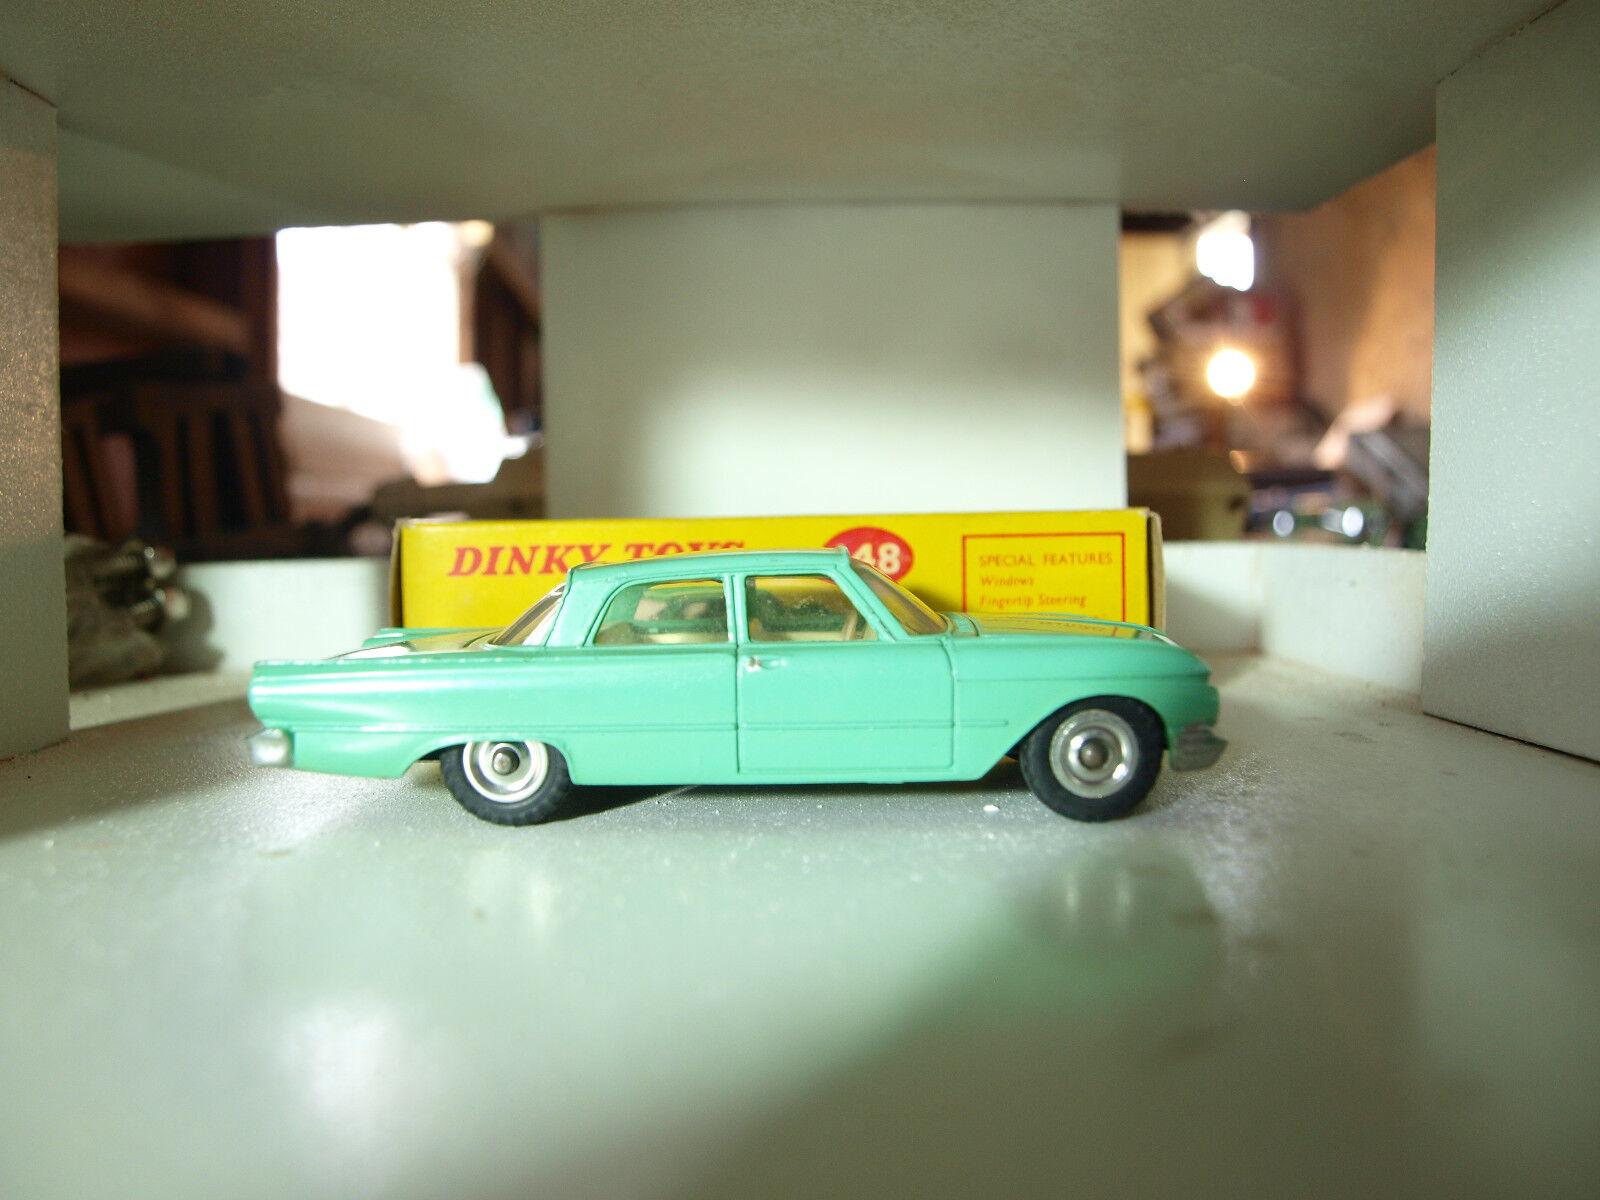 Vintage Dinky Ford Fairlane No.148. completo Con Caja Original.